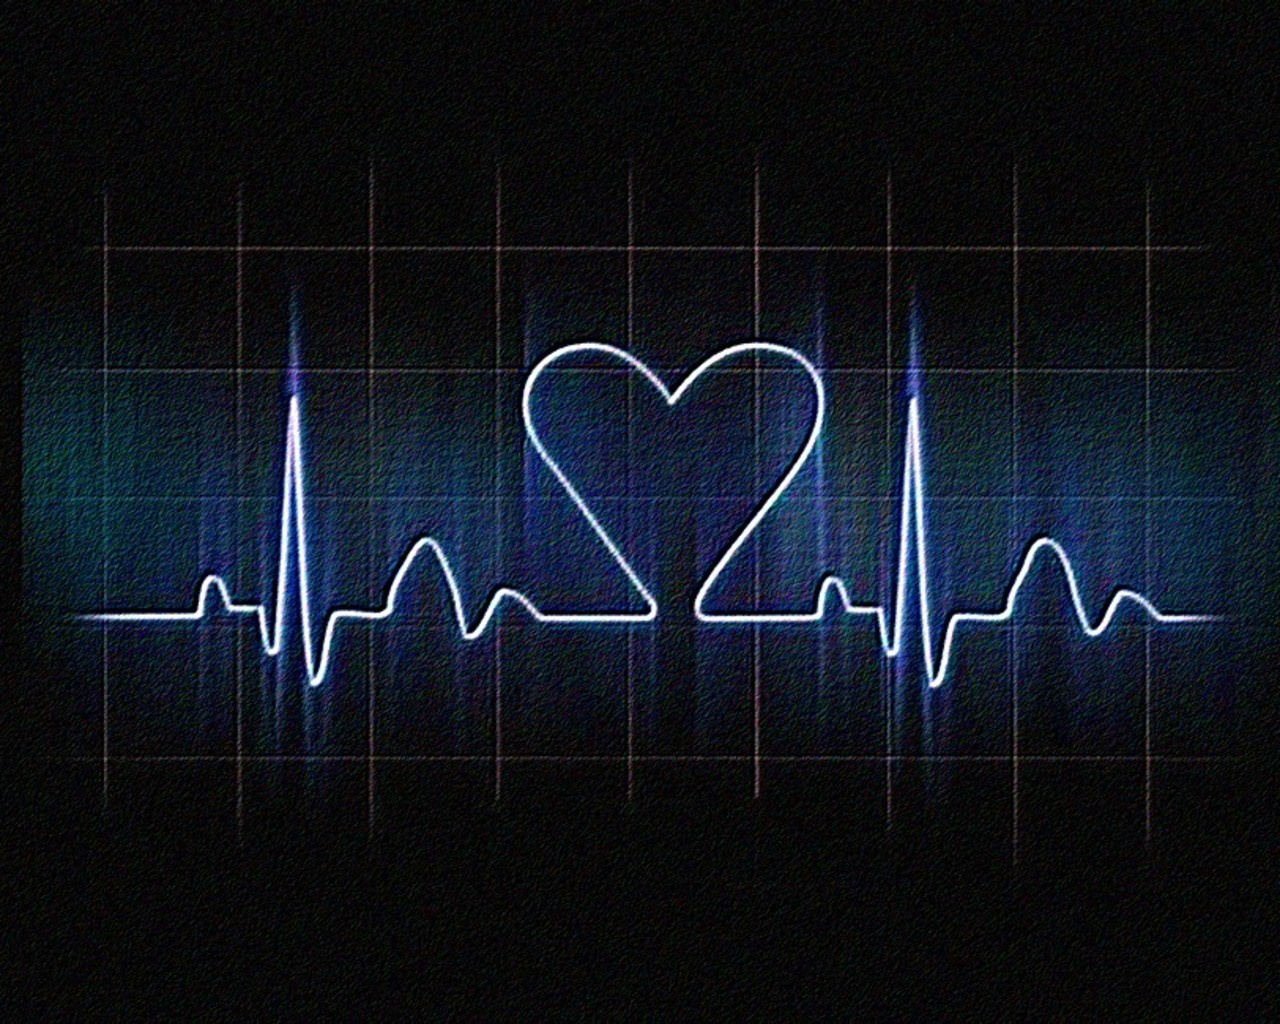 Love Wallpaper For Tablet: Love Pulse Wallpaper Tab